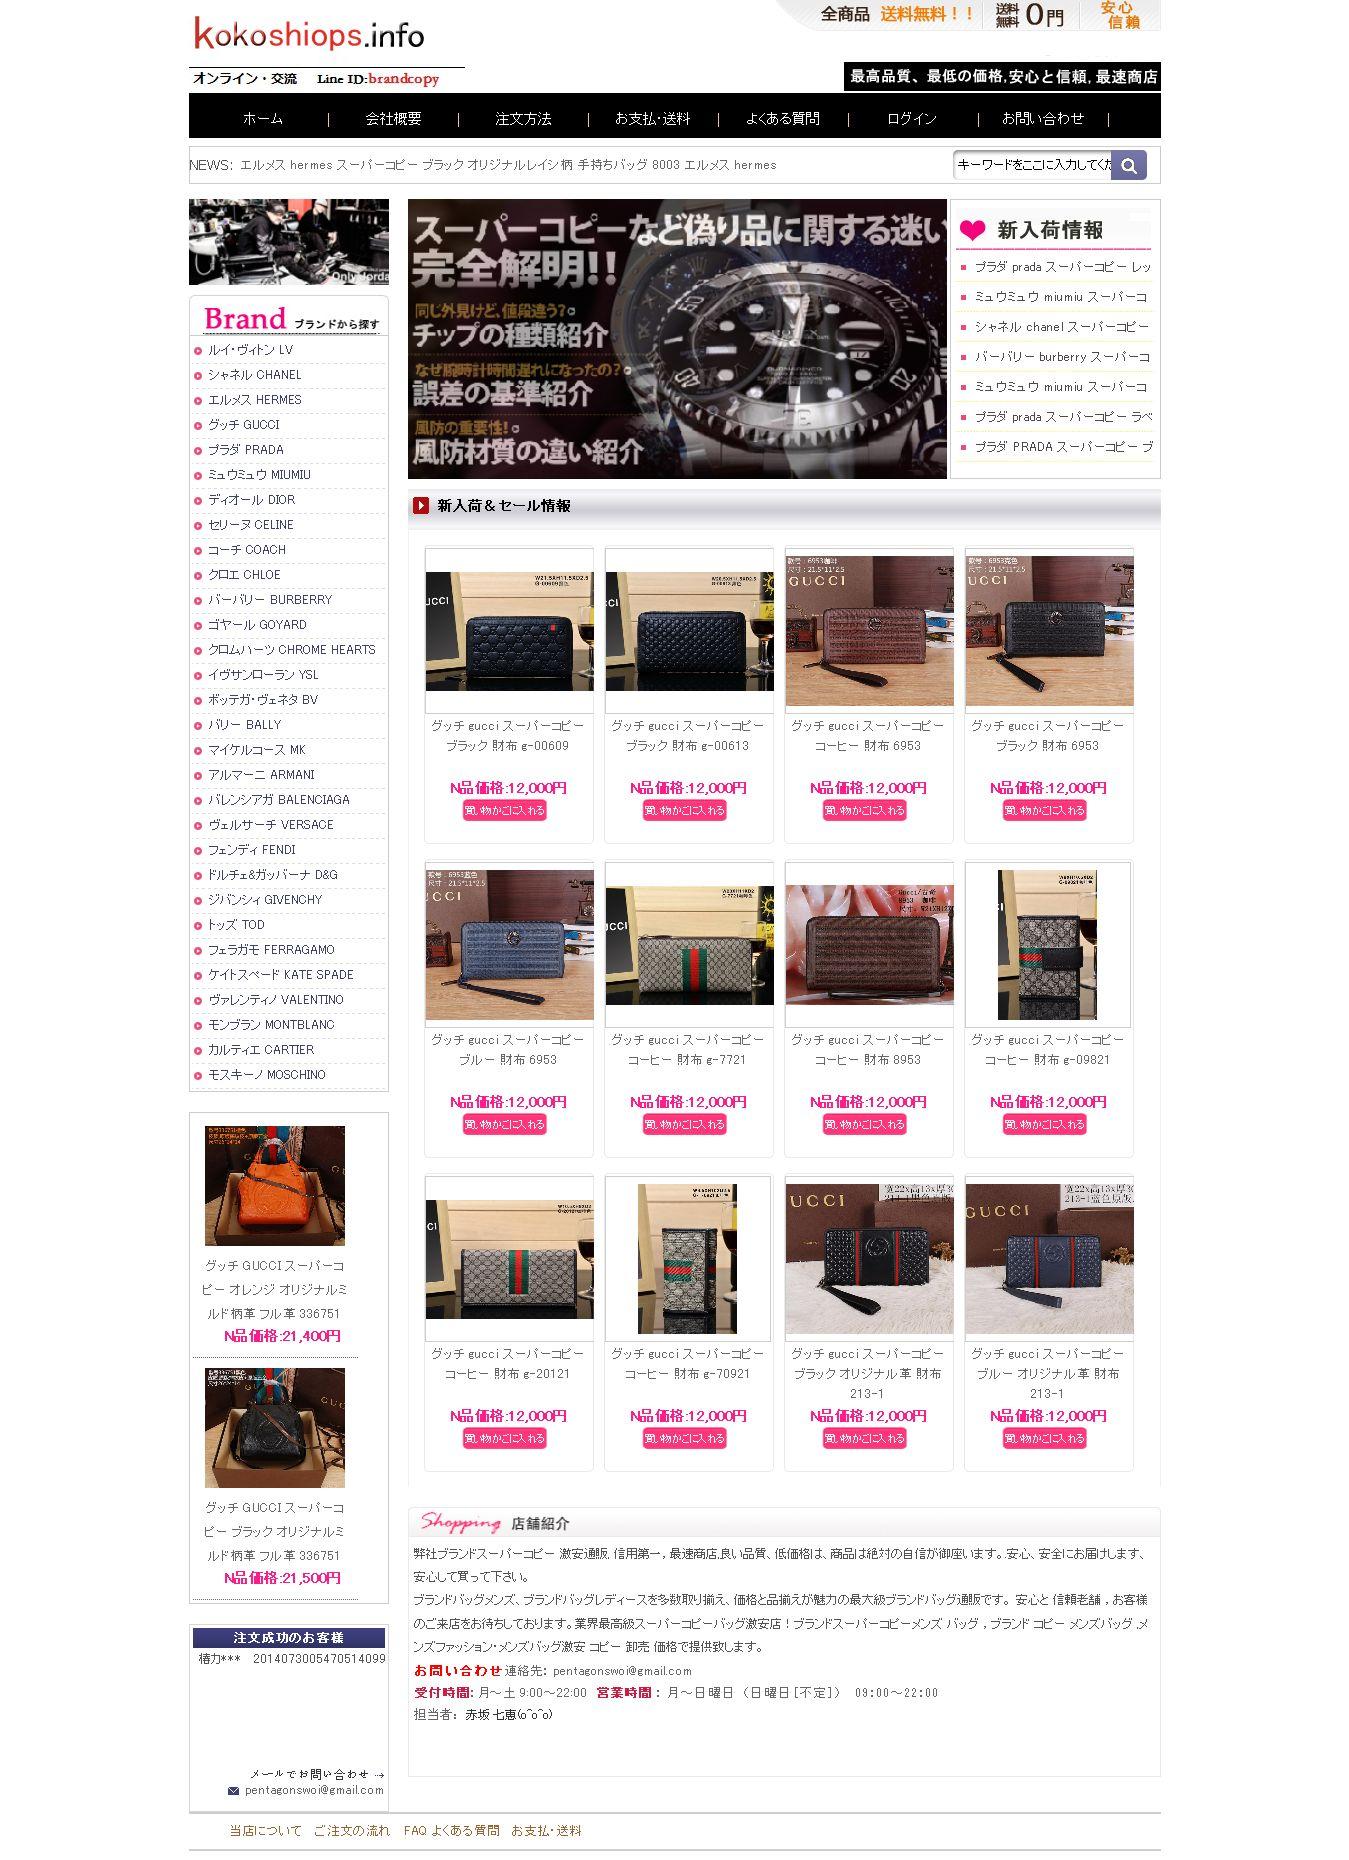 c700ef136760 コピー プラダ コピー,プラダ コピー 2013新作,prada スーパーコピー キーケース リボン